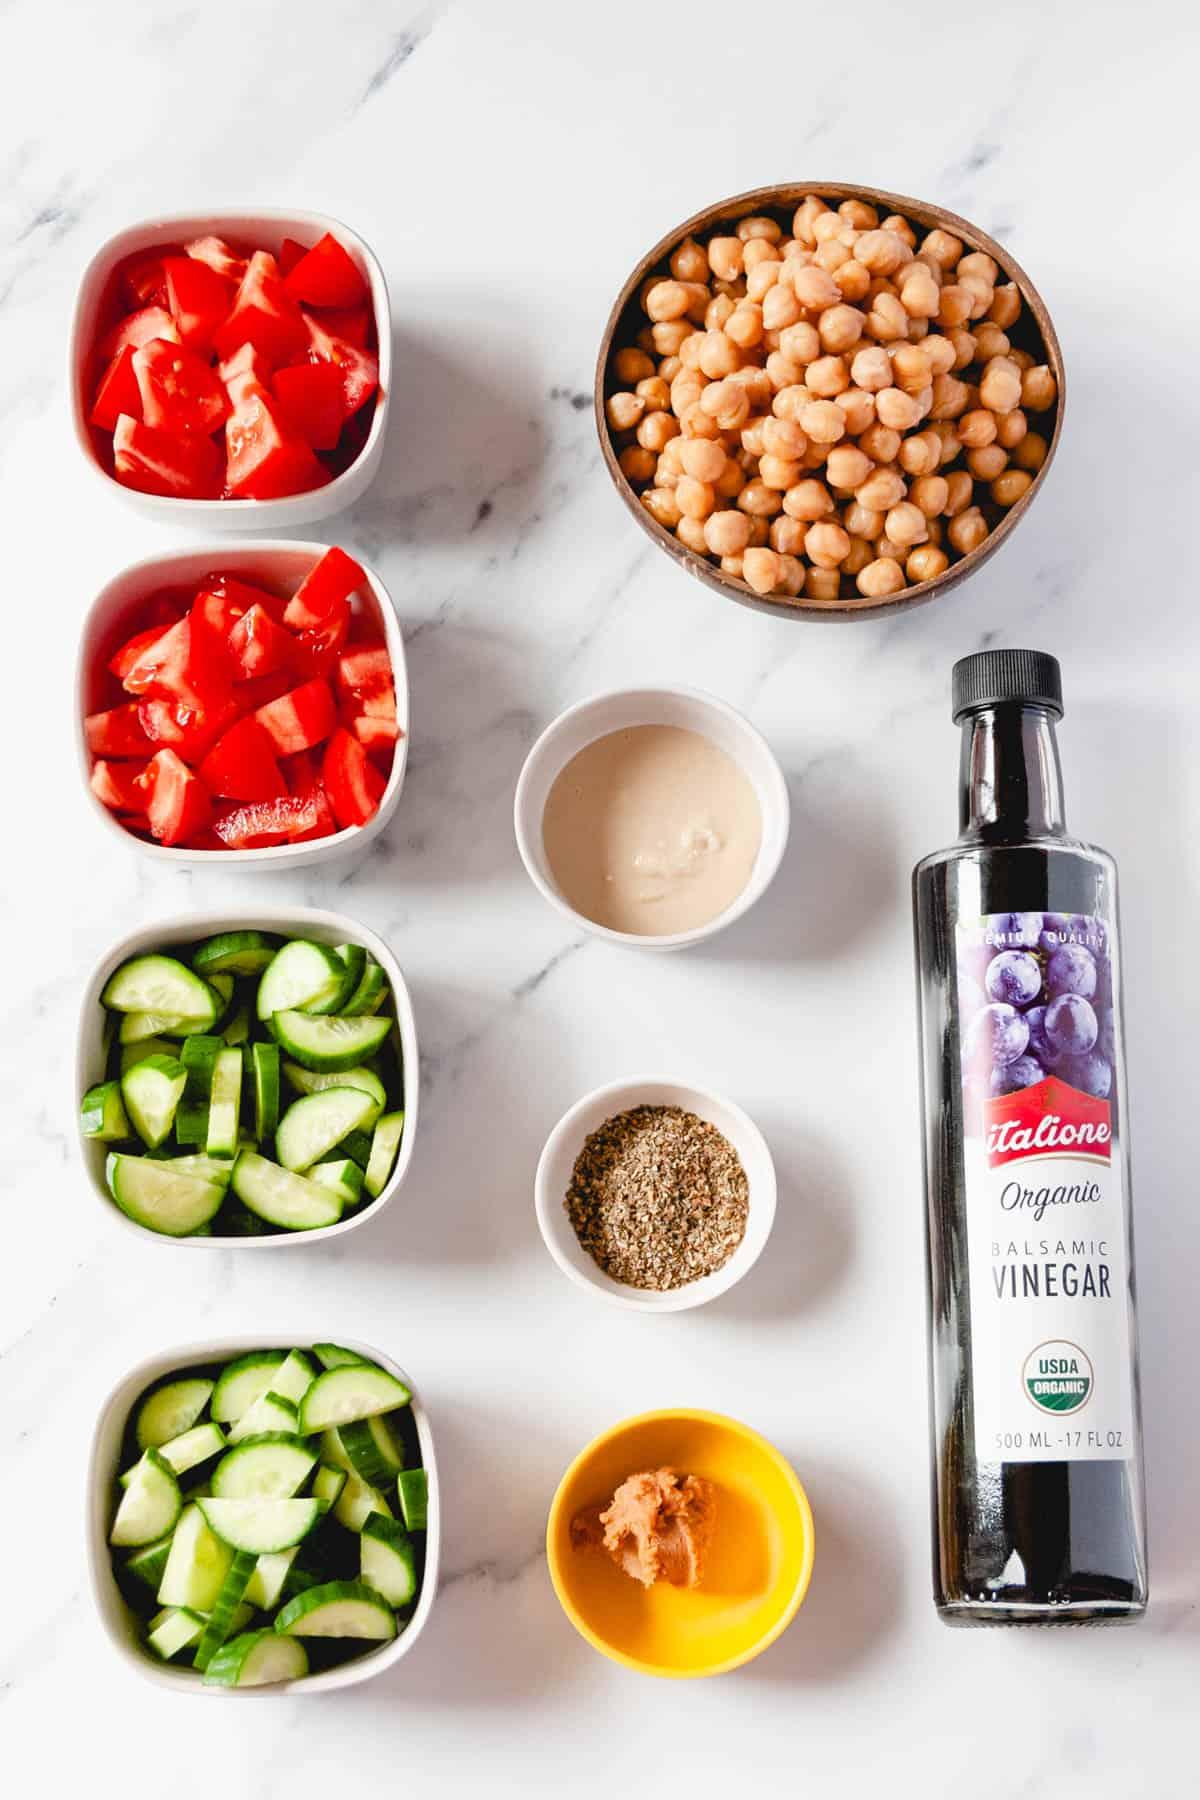 Tomatoes, cucumbers, chickpeas, tahini, balsamic, Italian seasoning, and miso arranged on countertop